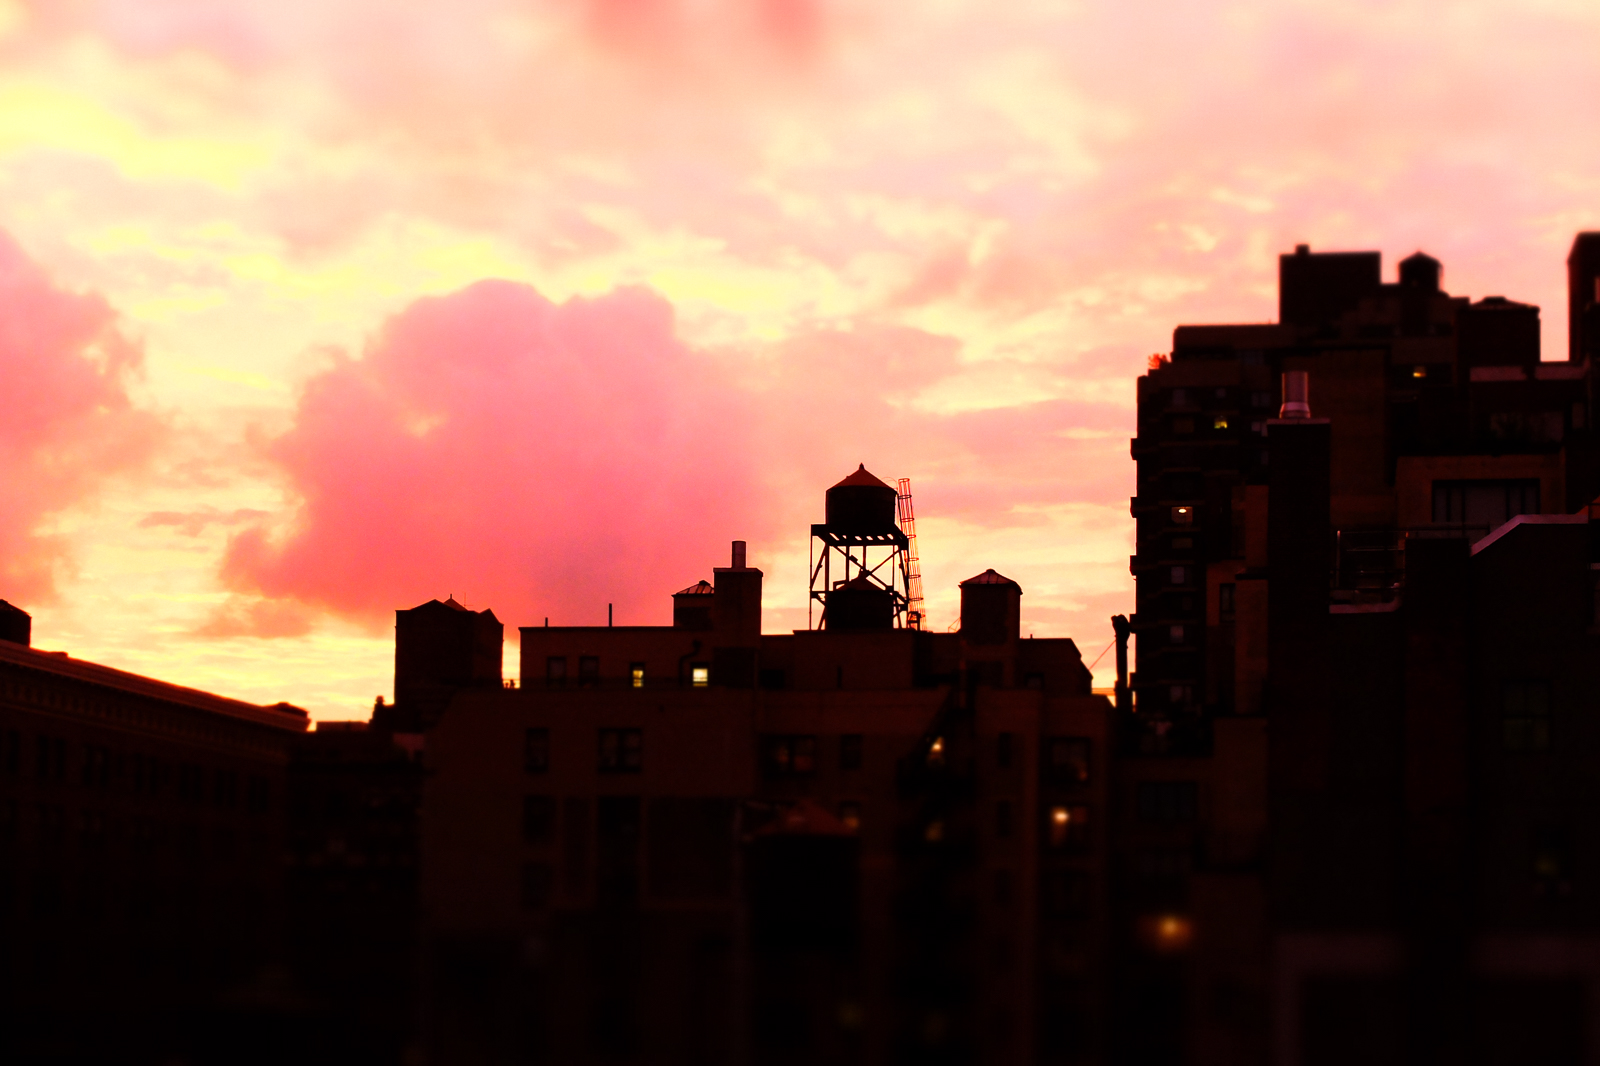 BARBAPAPA, NYC by Carine